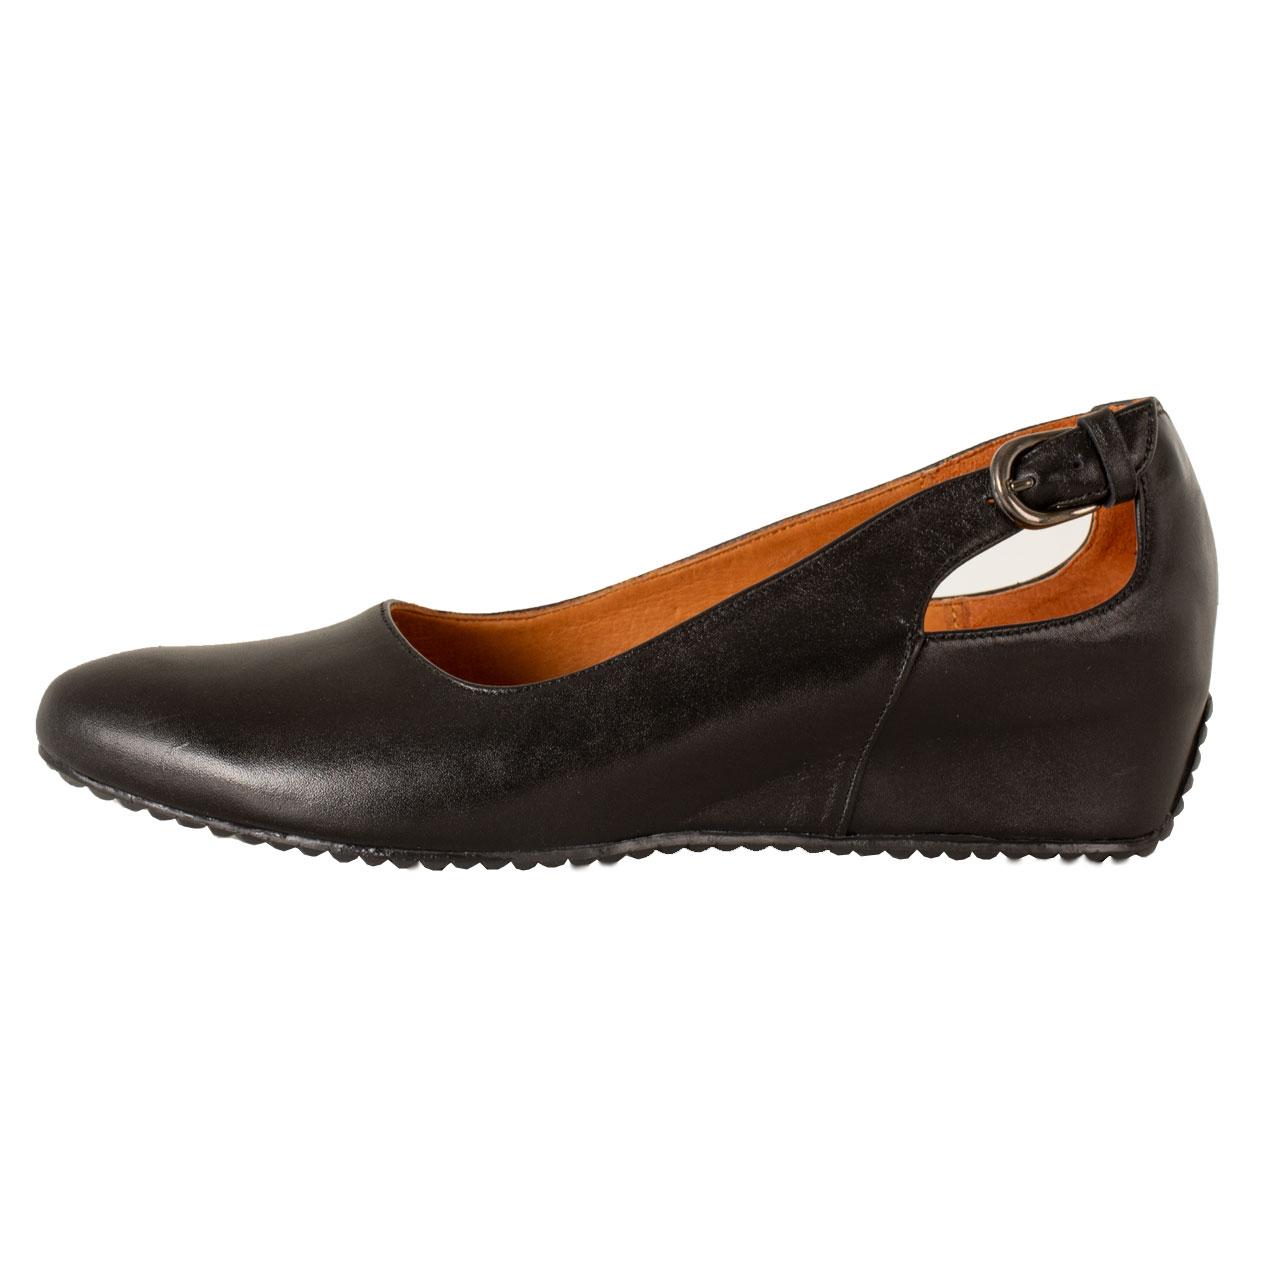 کفش روزمره زنانه پارینه چرم مدل SHOW30